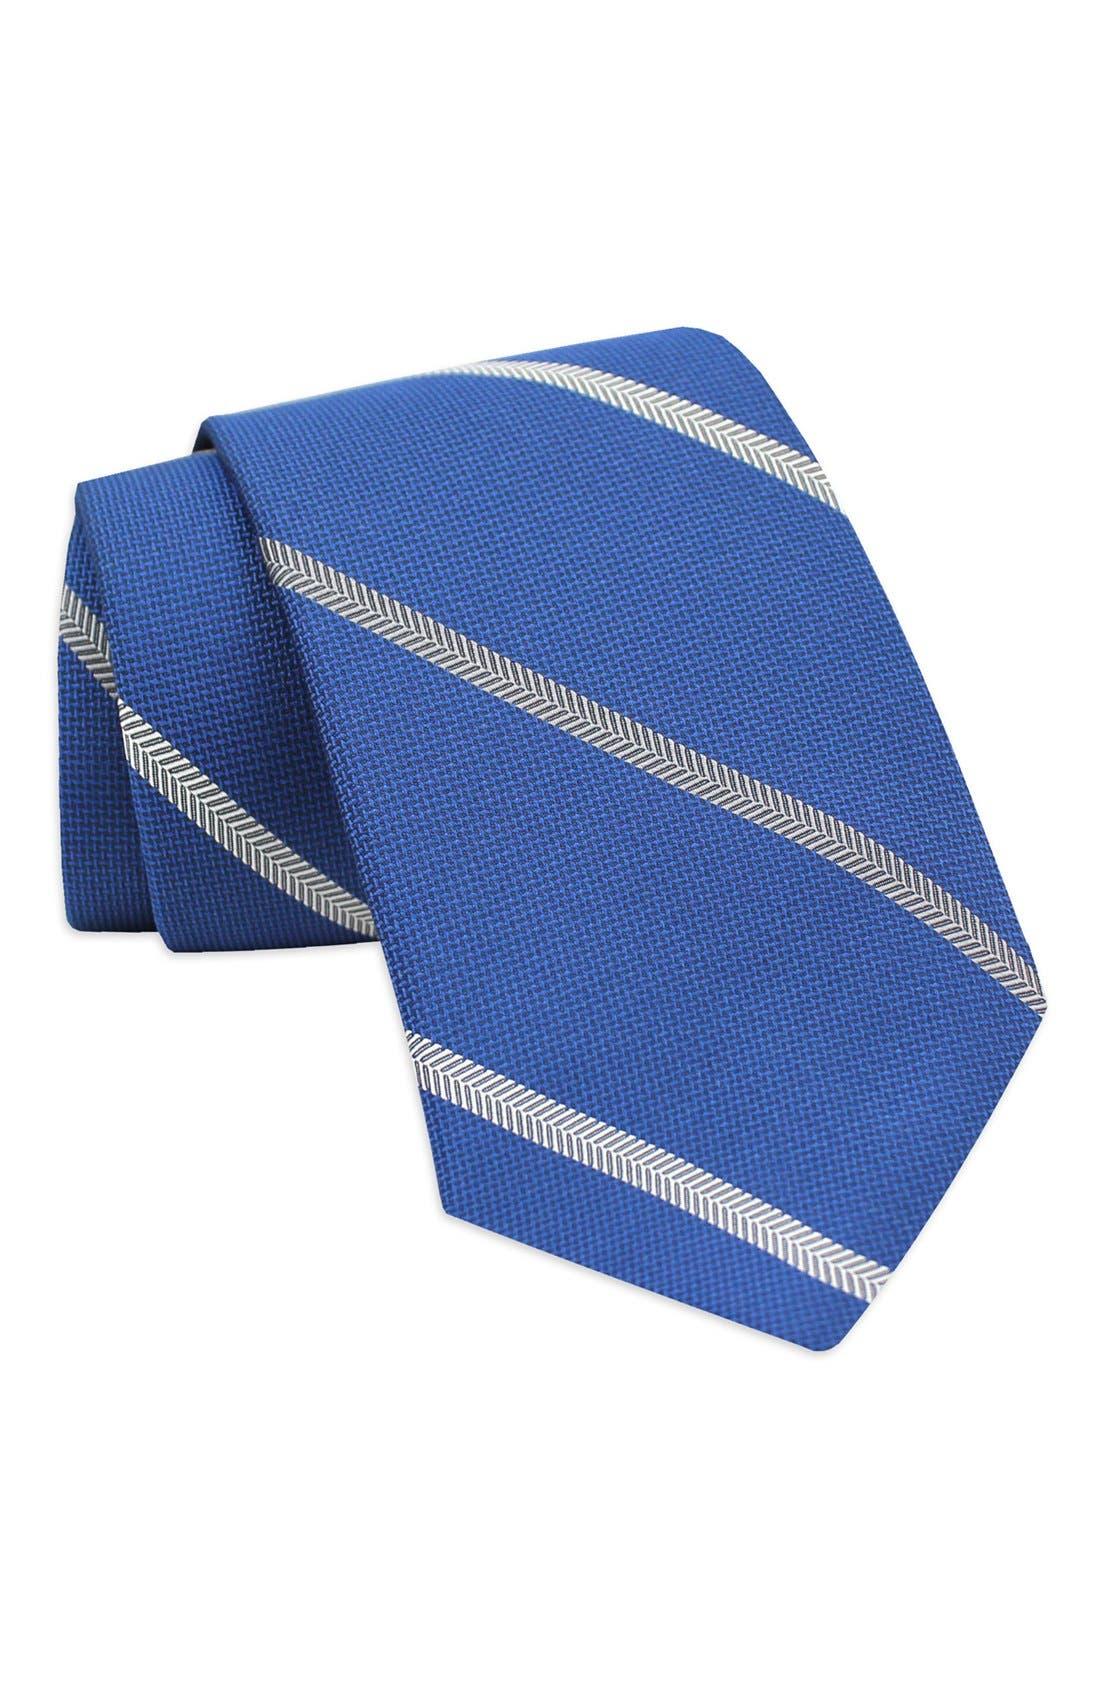 Alternate Image 1 Selected - Gitman Stripe Woven Silk Tie